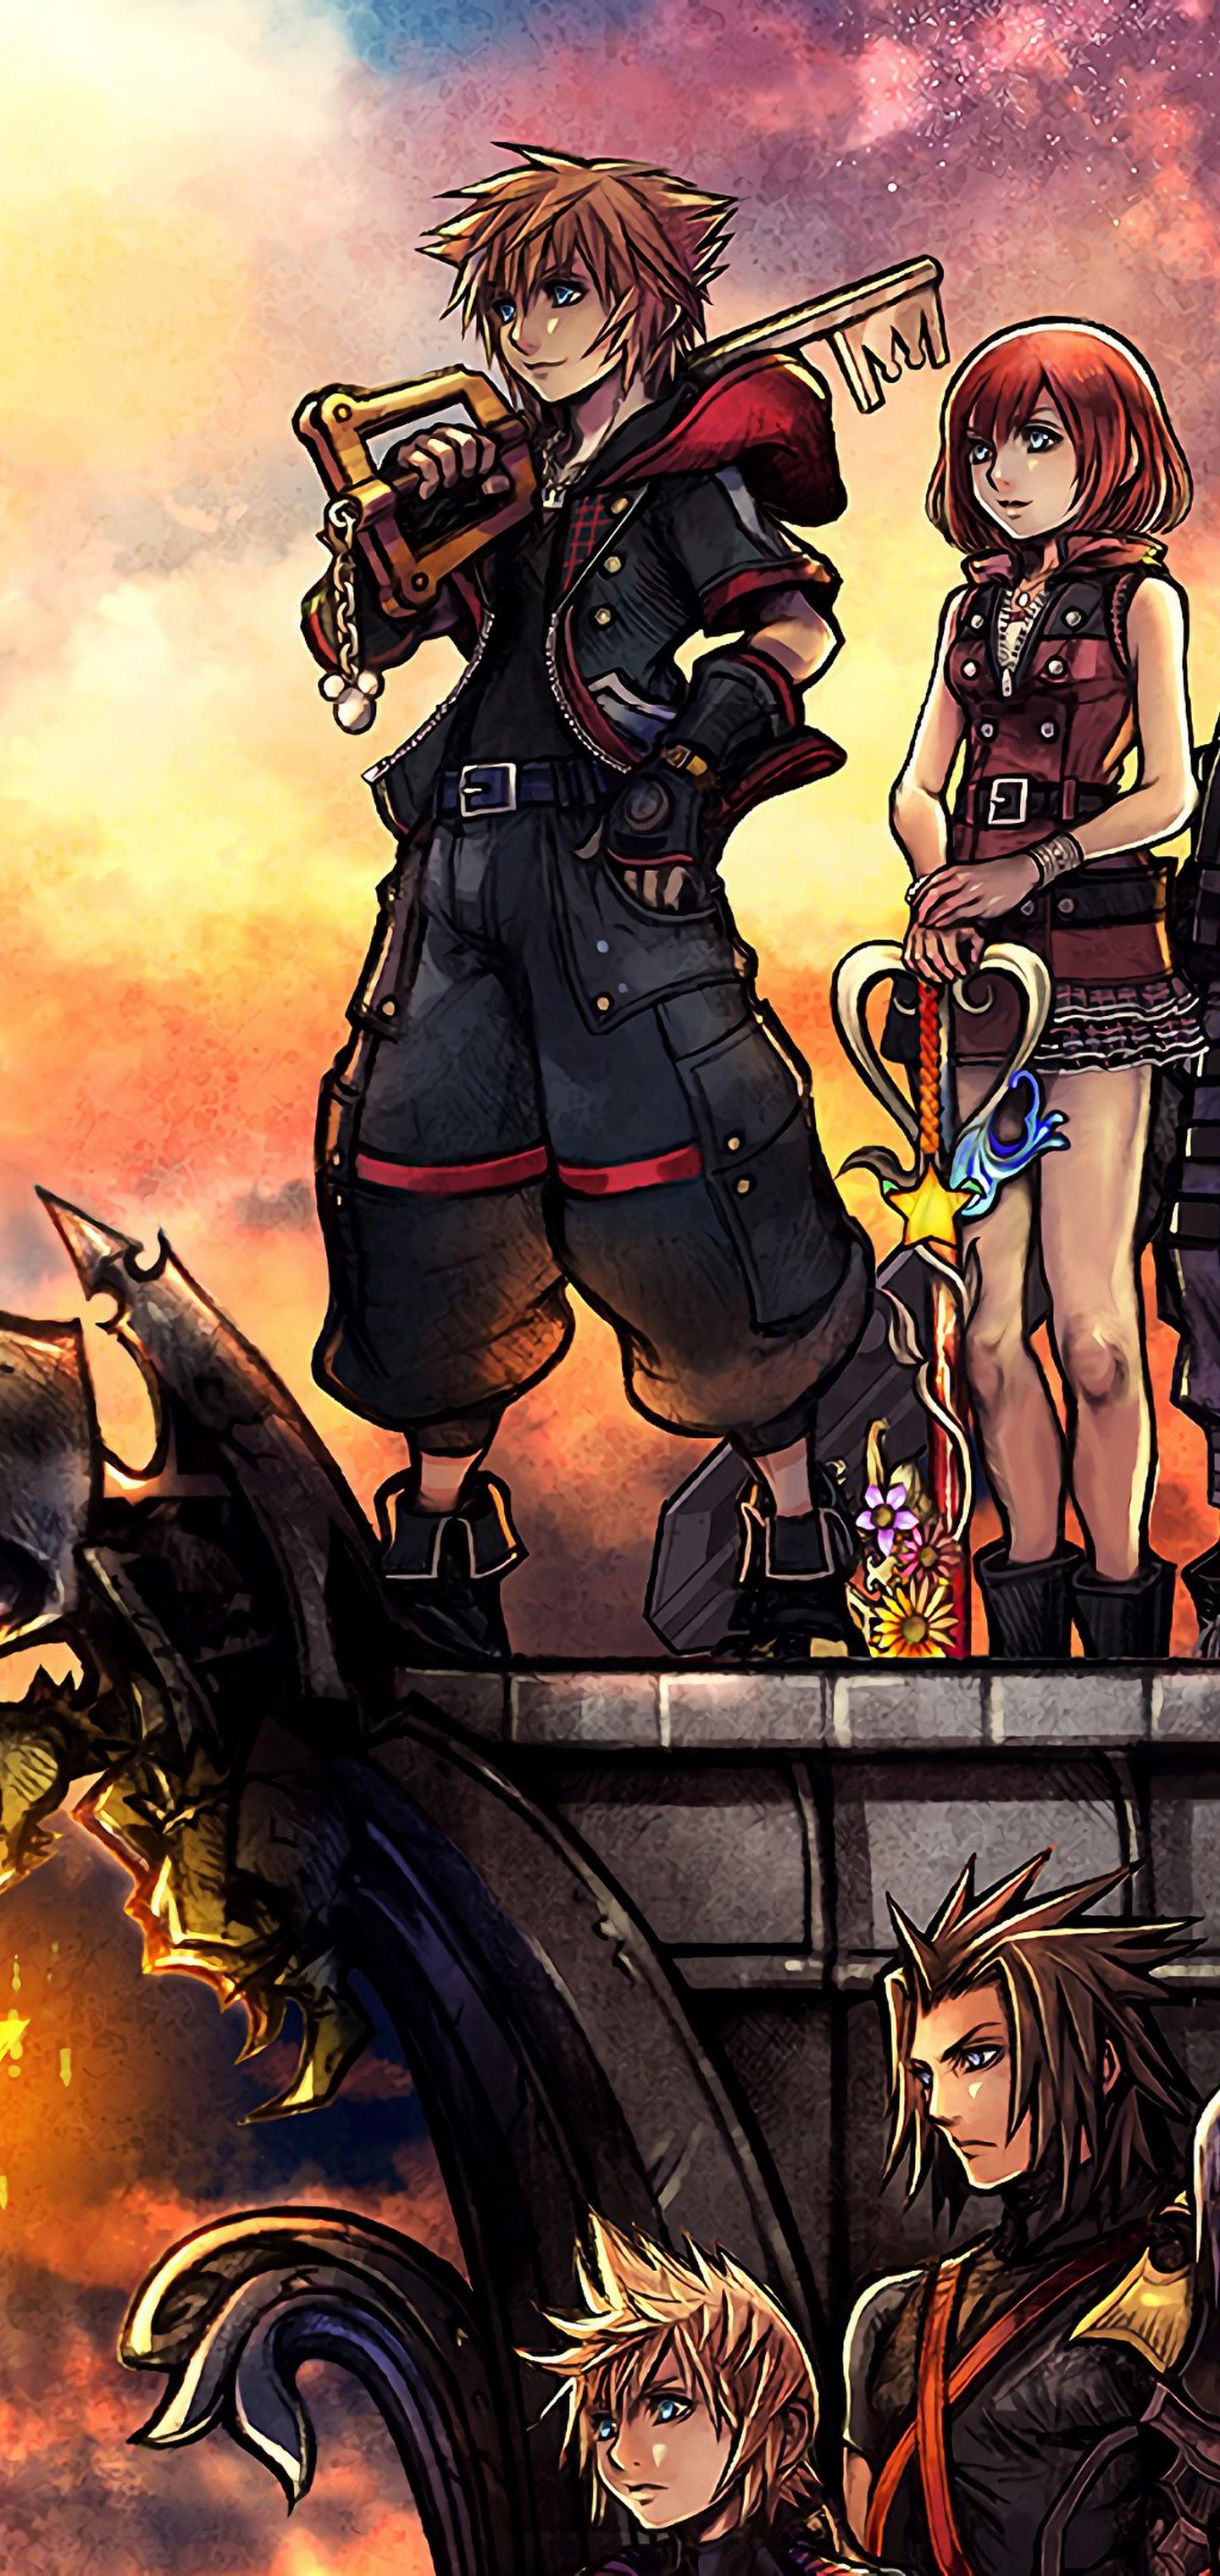 Kingdom Hearts 3 Characters 4k 3840x2160 Wallpaper 12